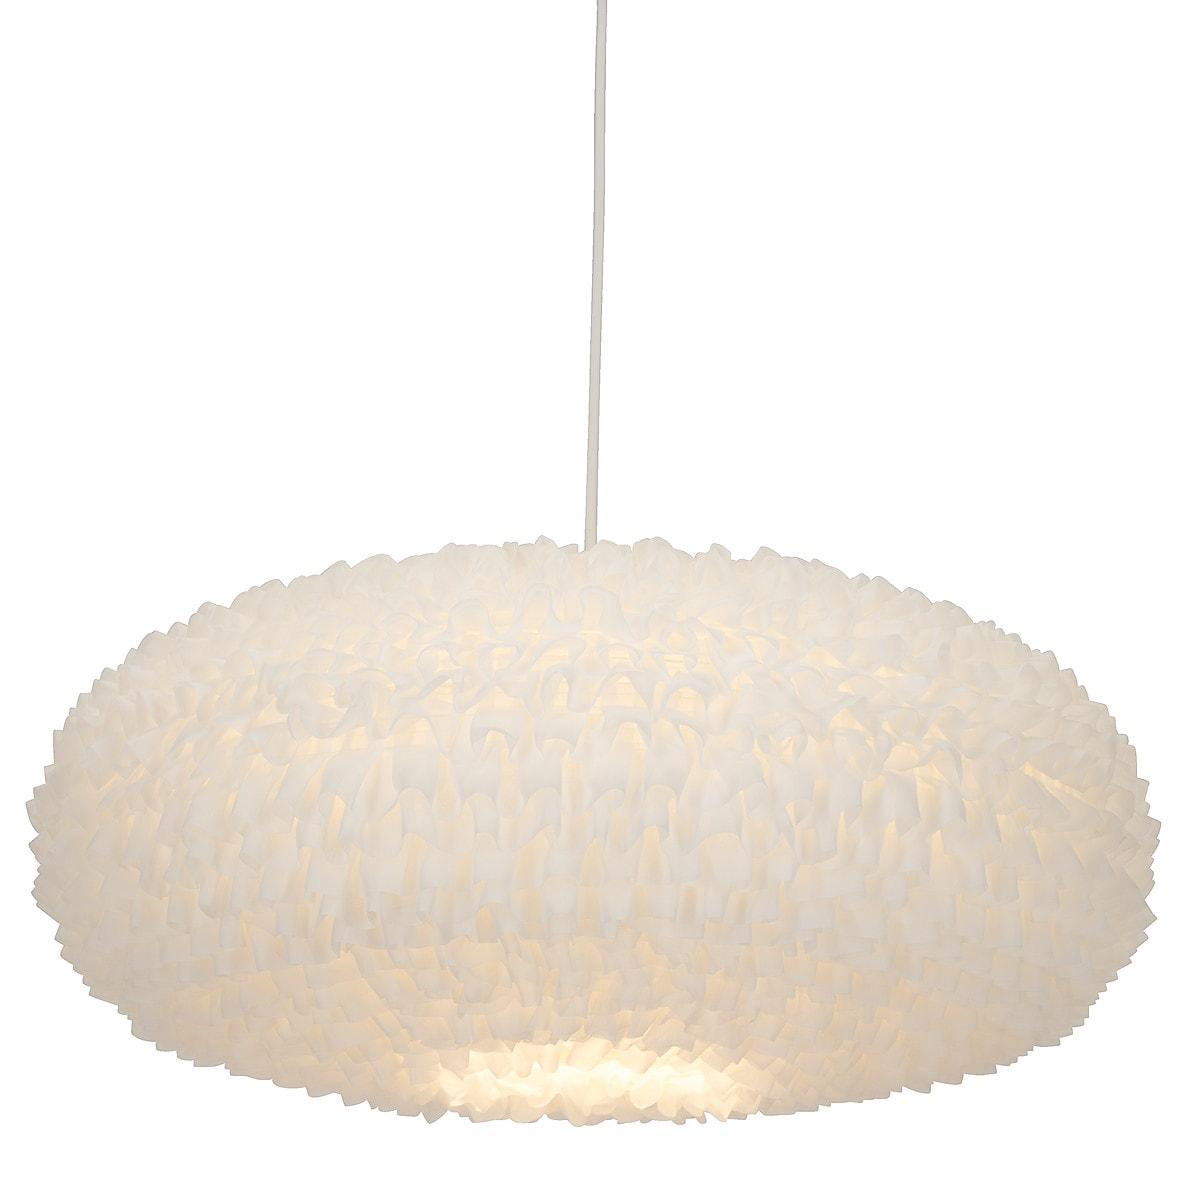 Northlight Chiffon Ceiling Light